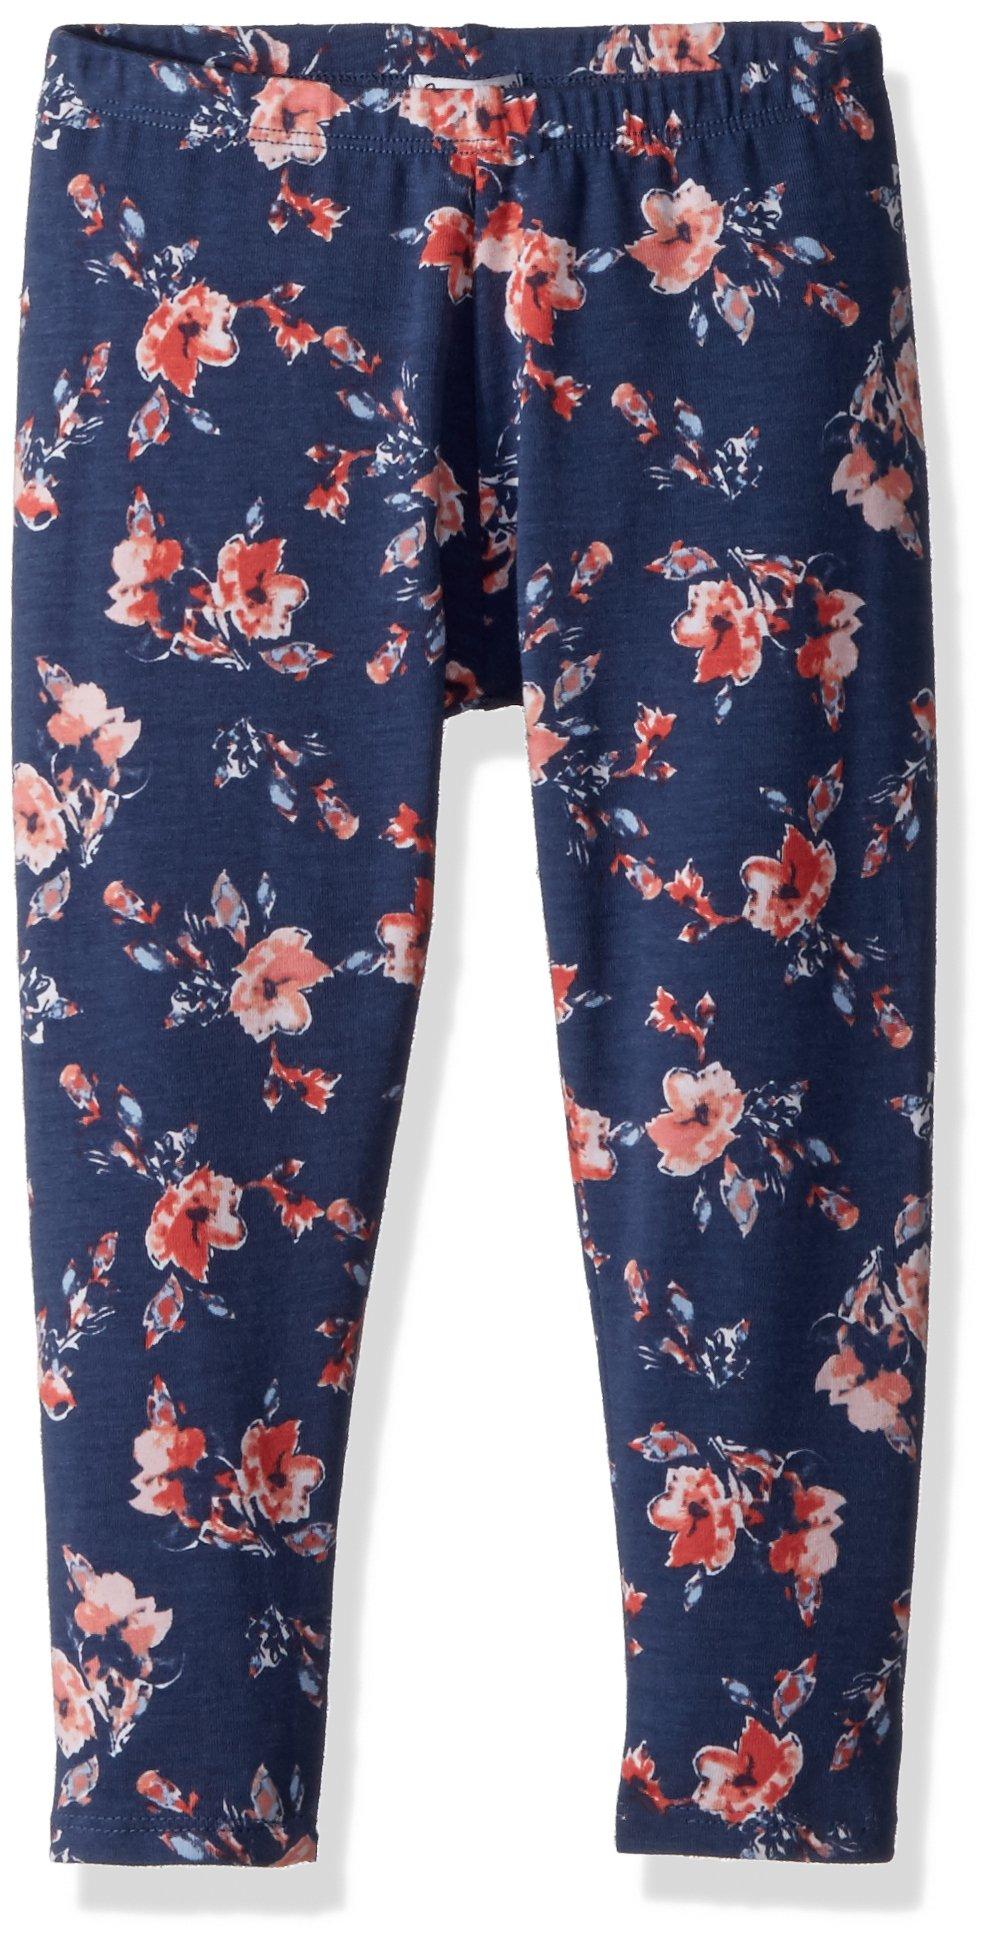 Splendid Little Girls' Floral Print Legging, Indigo Fade, 5/6